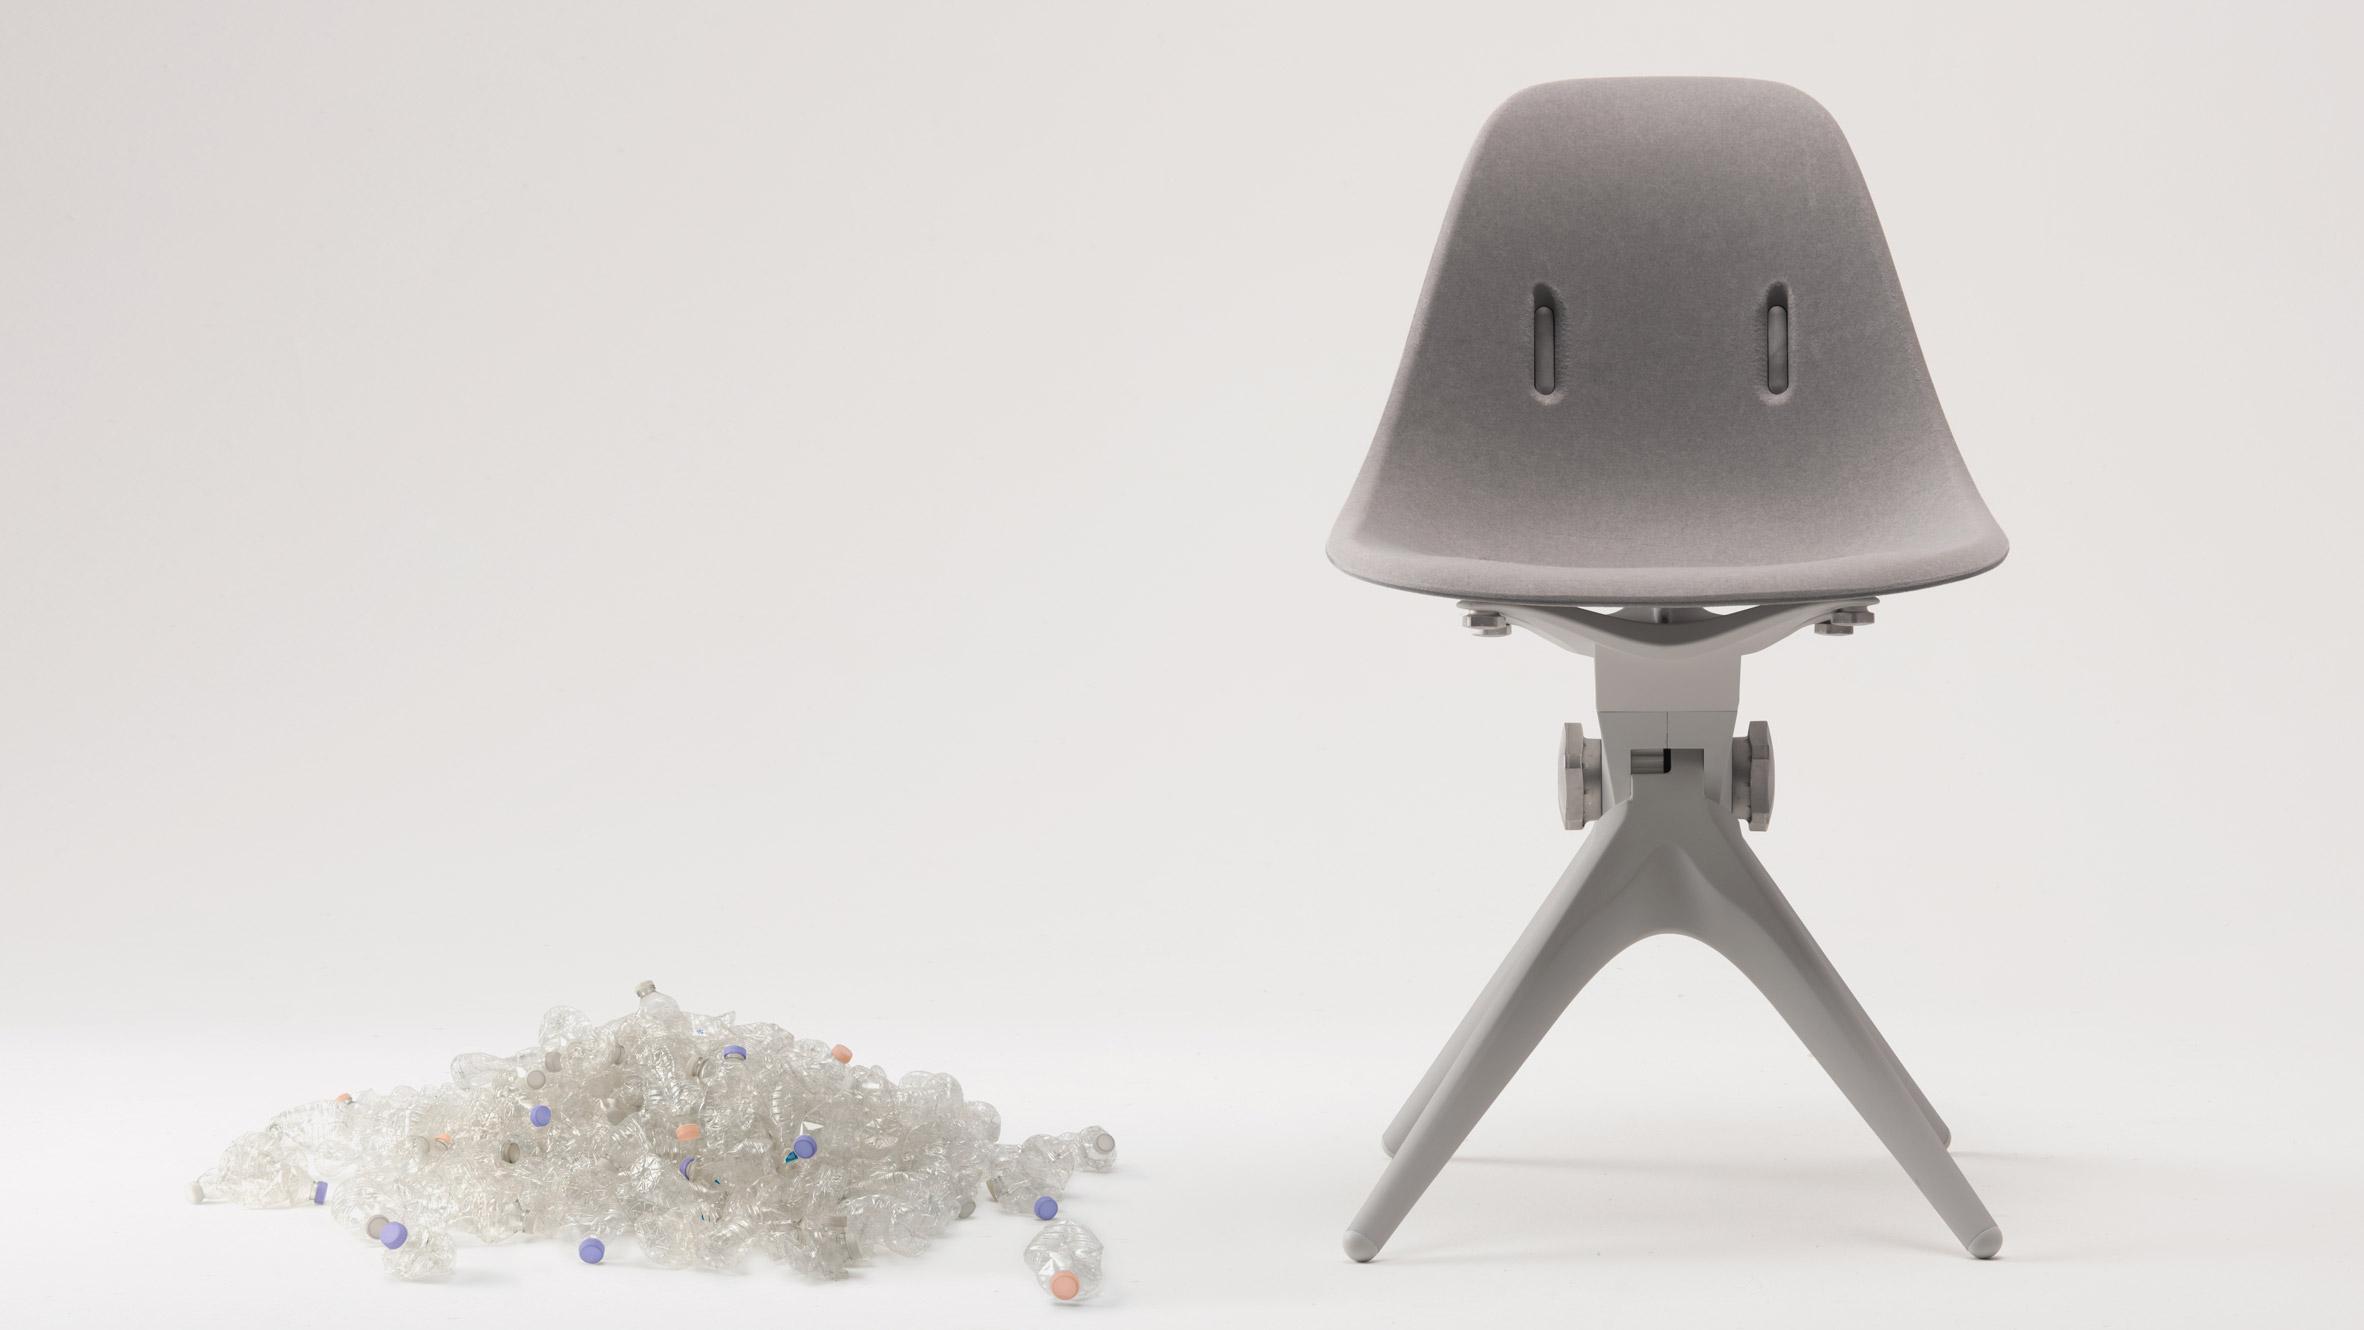 pentatonic-launch-flat-pack-furniture-sustainable-design_dezeen_hero.jpg